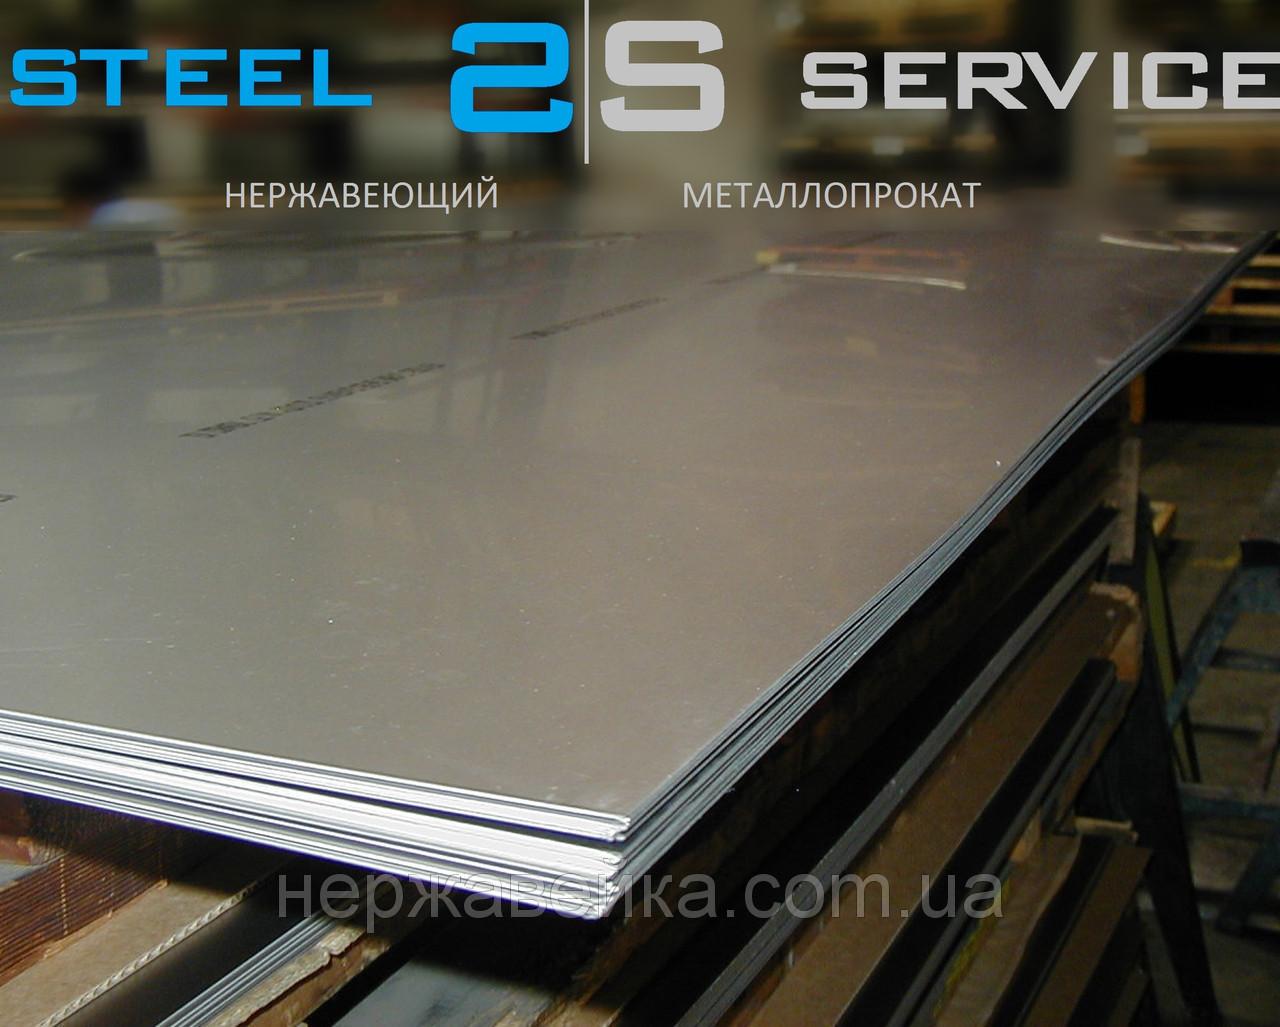 Нержавейка лист 1х1250х2500мм  AISI 316L(03Х17Н14М3) 2B - матовый,  кислотостойкий